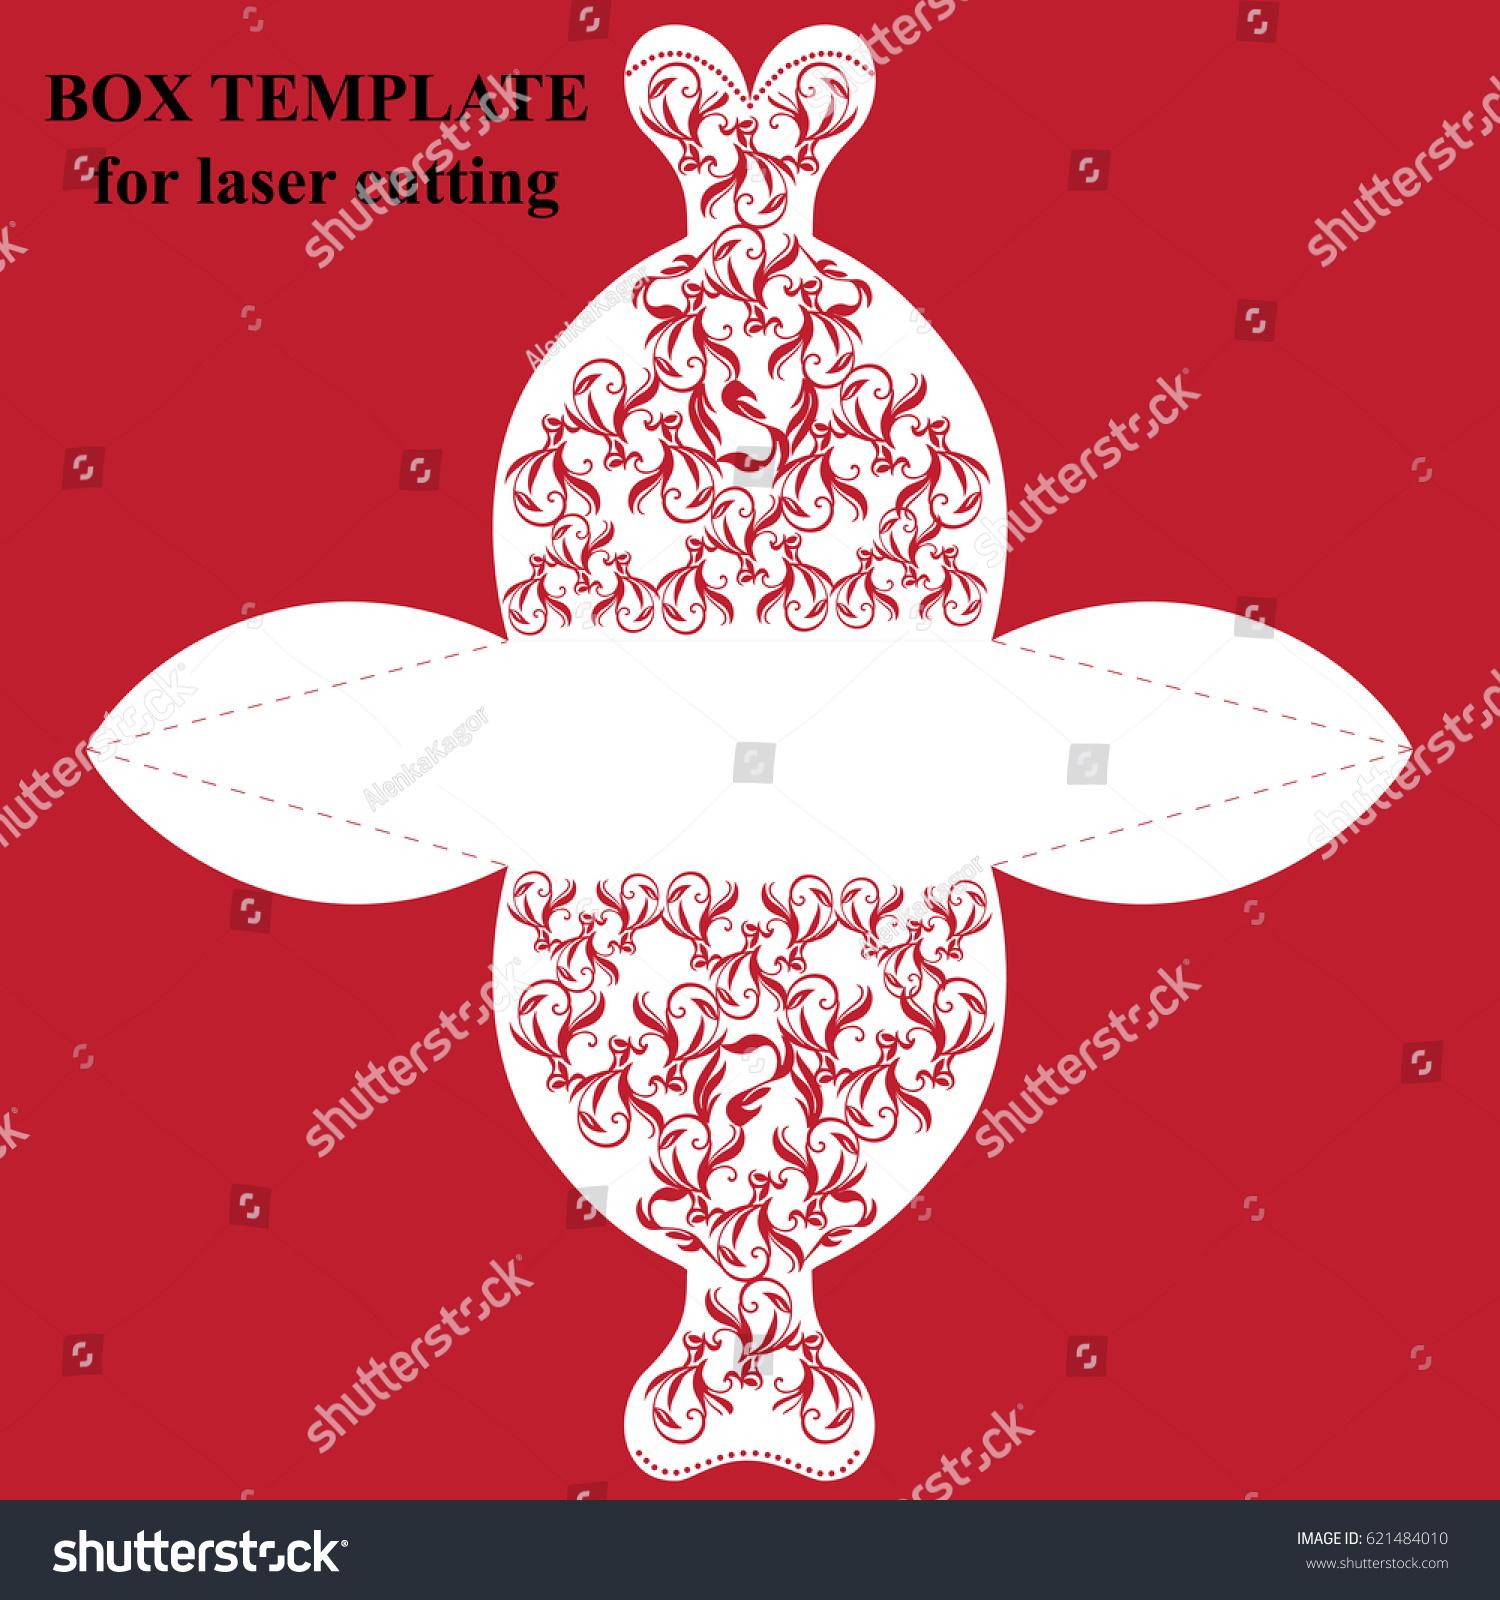 Wedding Invitation Greeting Card Bonbonniere Box Stock Vector ...